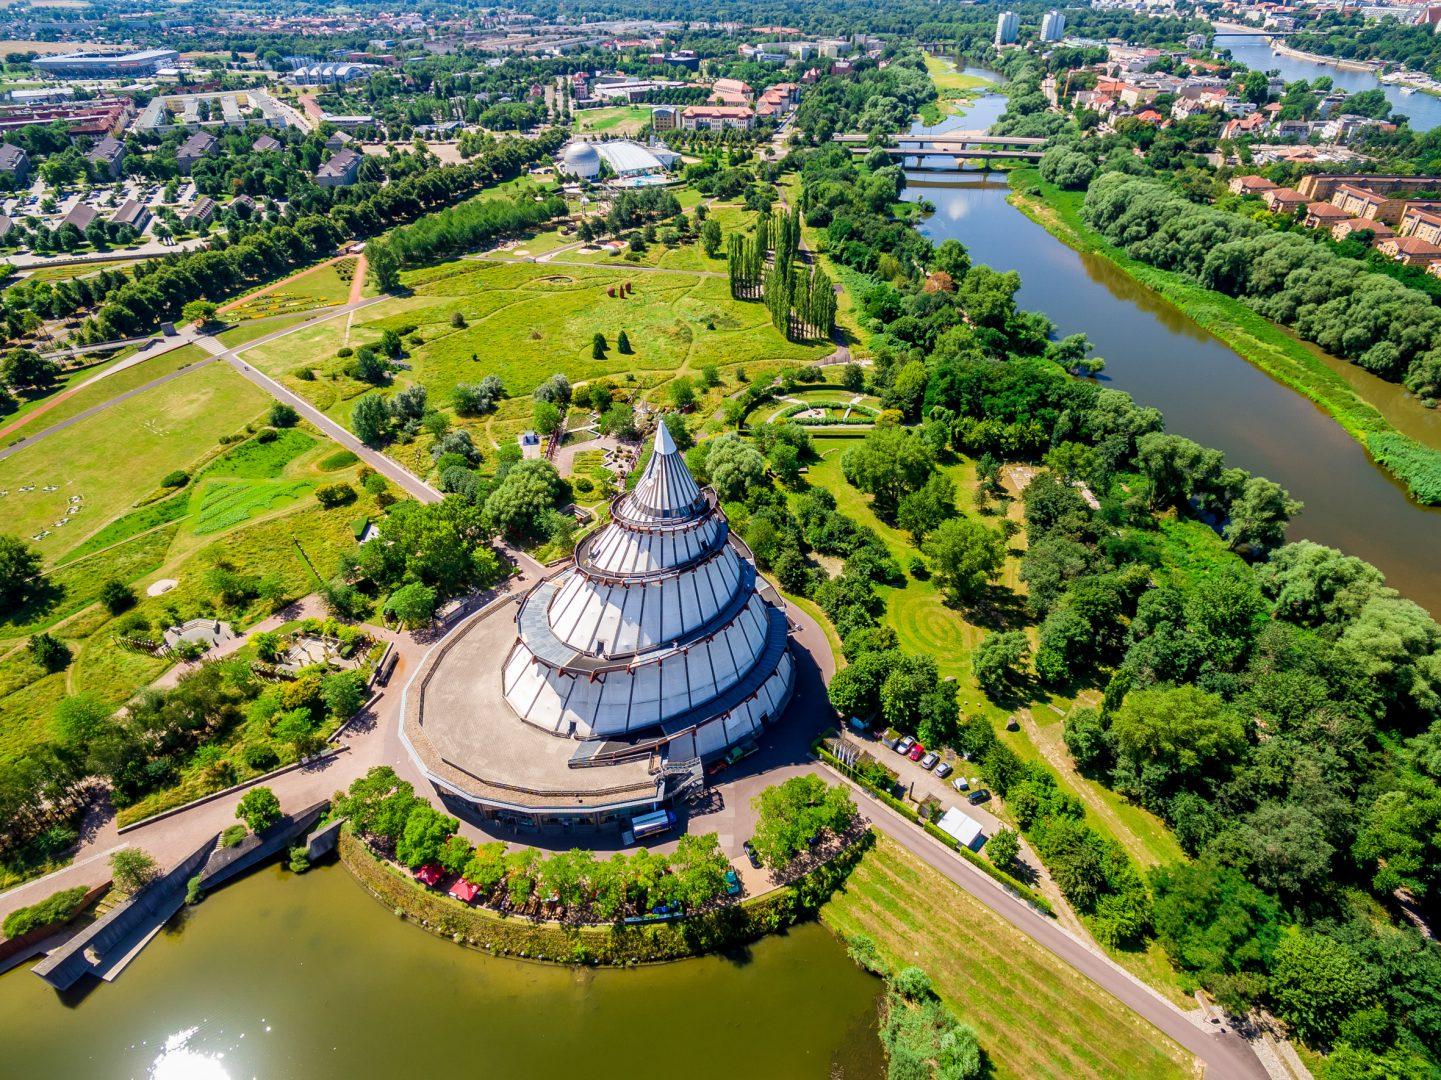 Jahrtausendturm, Magdeburg, Germany